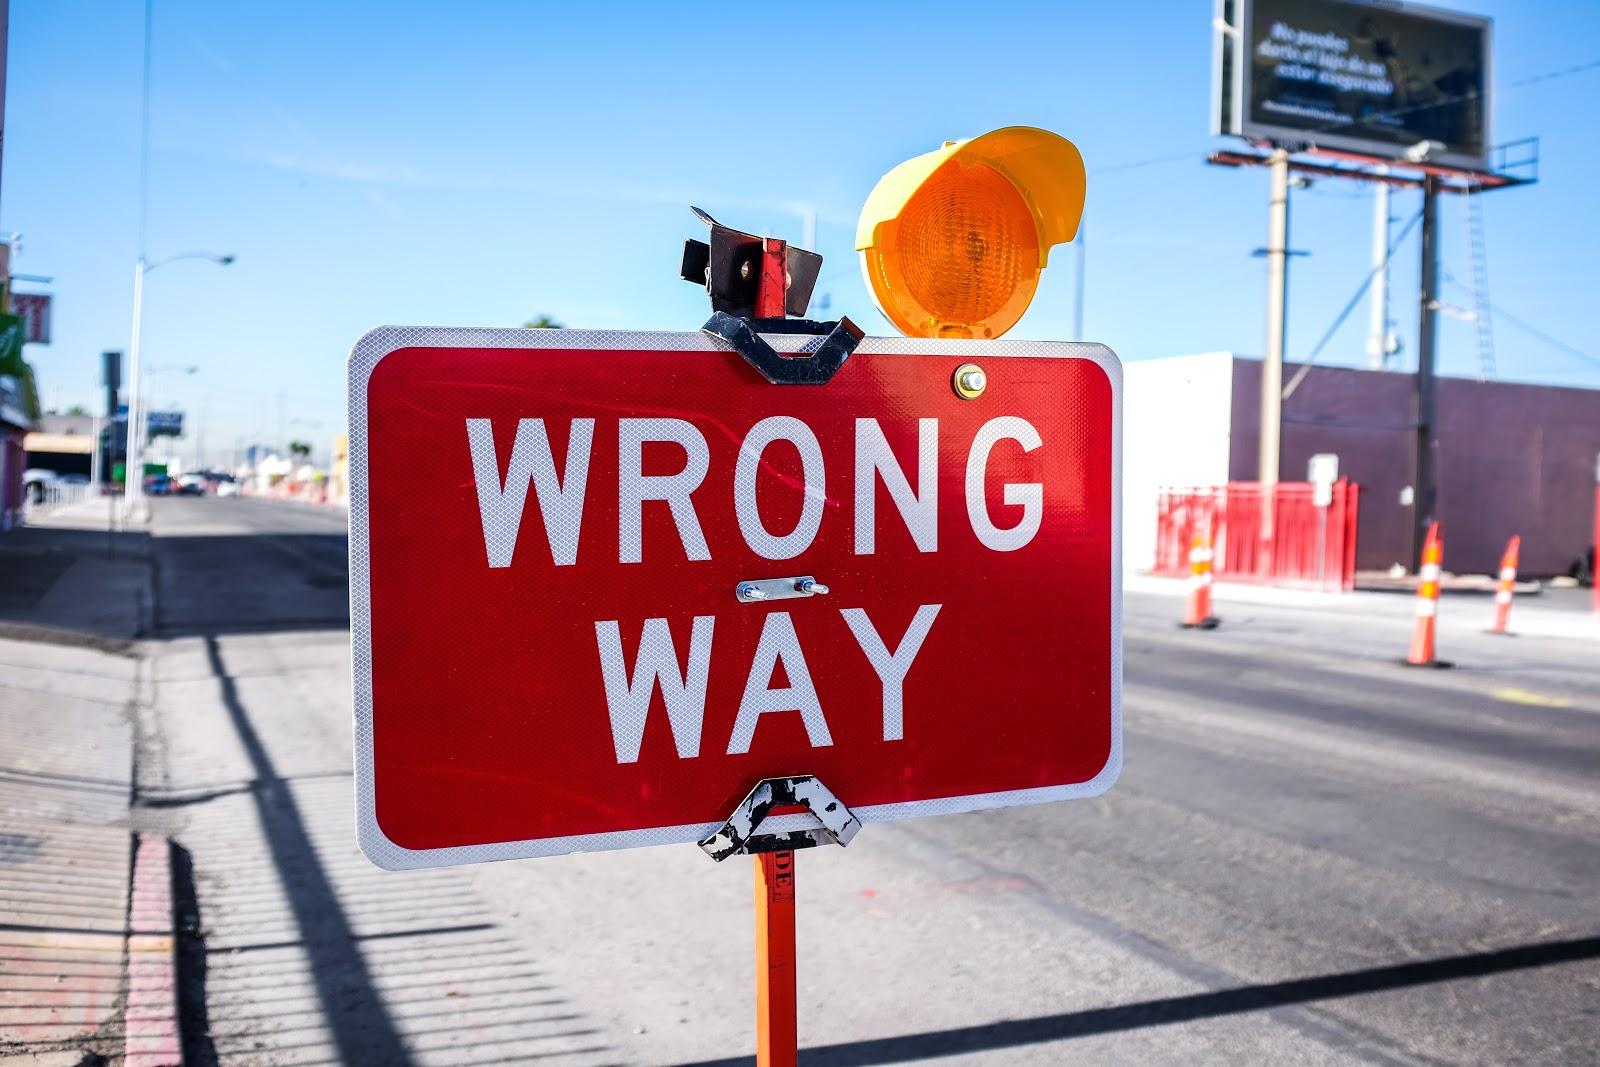 common marketing mistakes to avoid